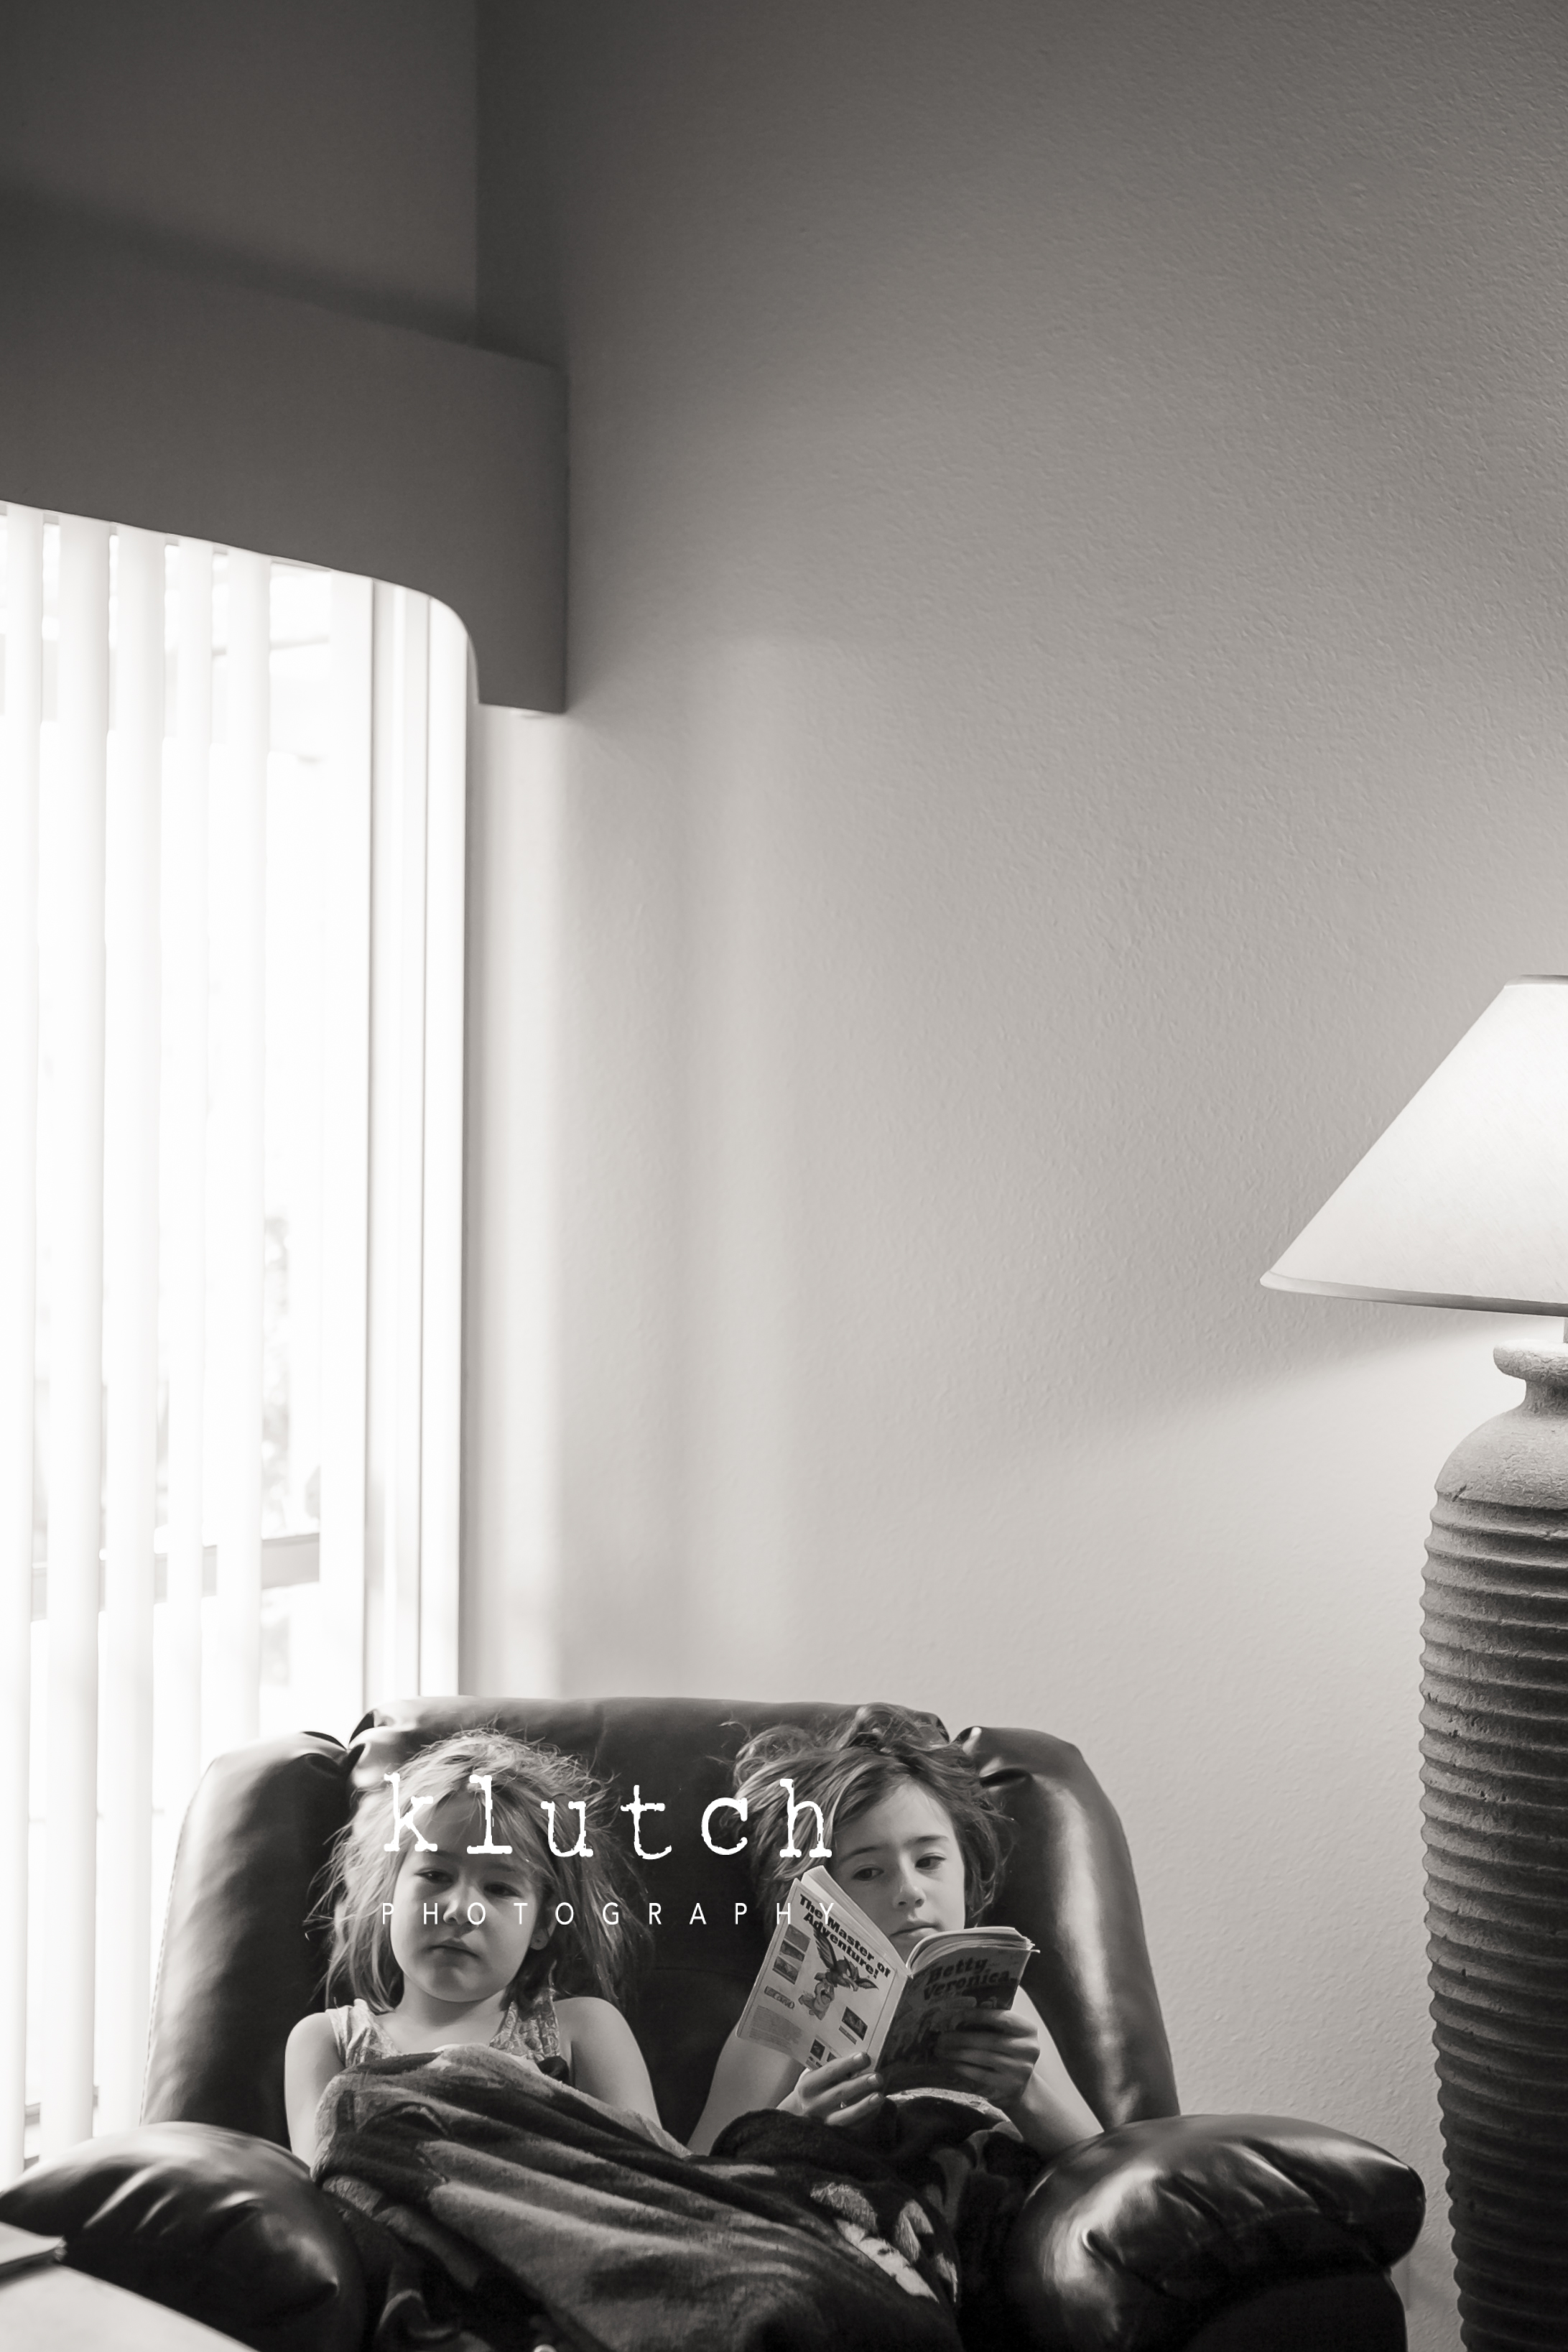 Klutch Photography,white rock family photographer, vancouver family photographer, whiterock lifestyle photographer, life unscripted photographer, life unscripted session, photography,Dina Ferreira Stoddard-7744.jpg